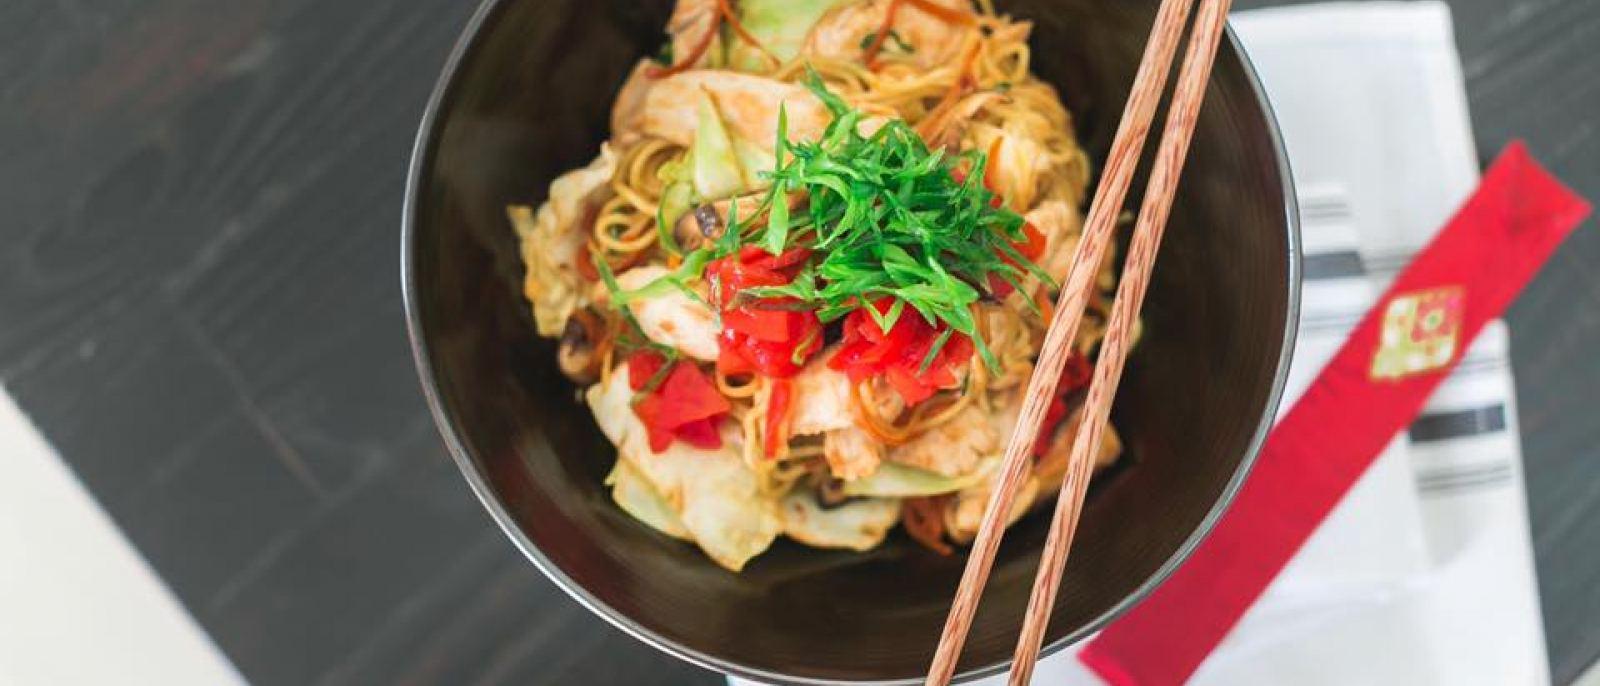 Mari Los Angeles - bowl of noodles.jpg